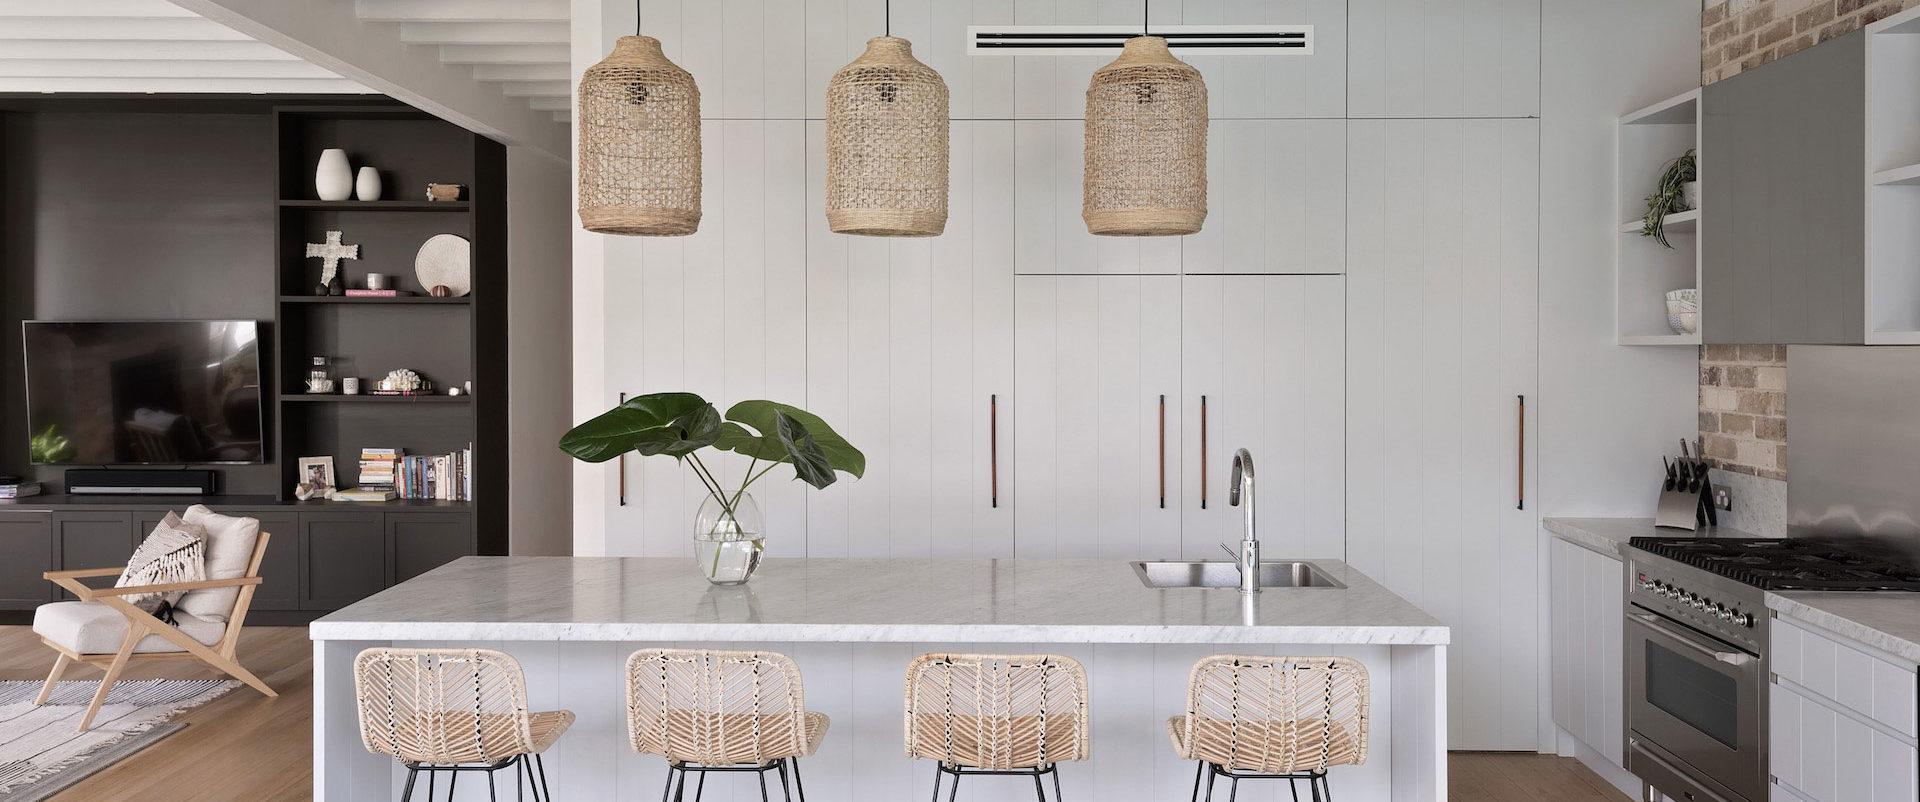 Sydney Interior Designer | Interior Decorating U0026 Styling ...